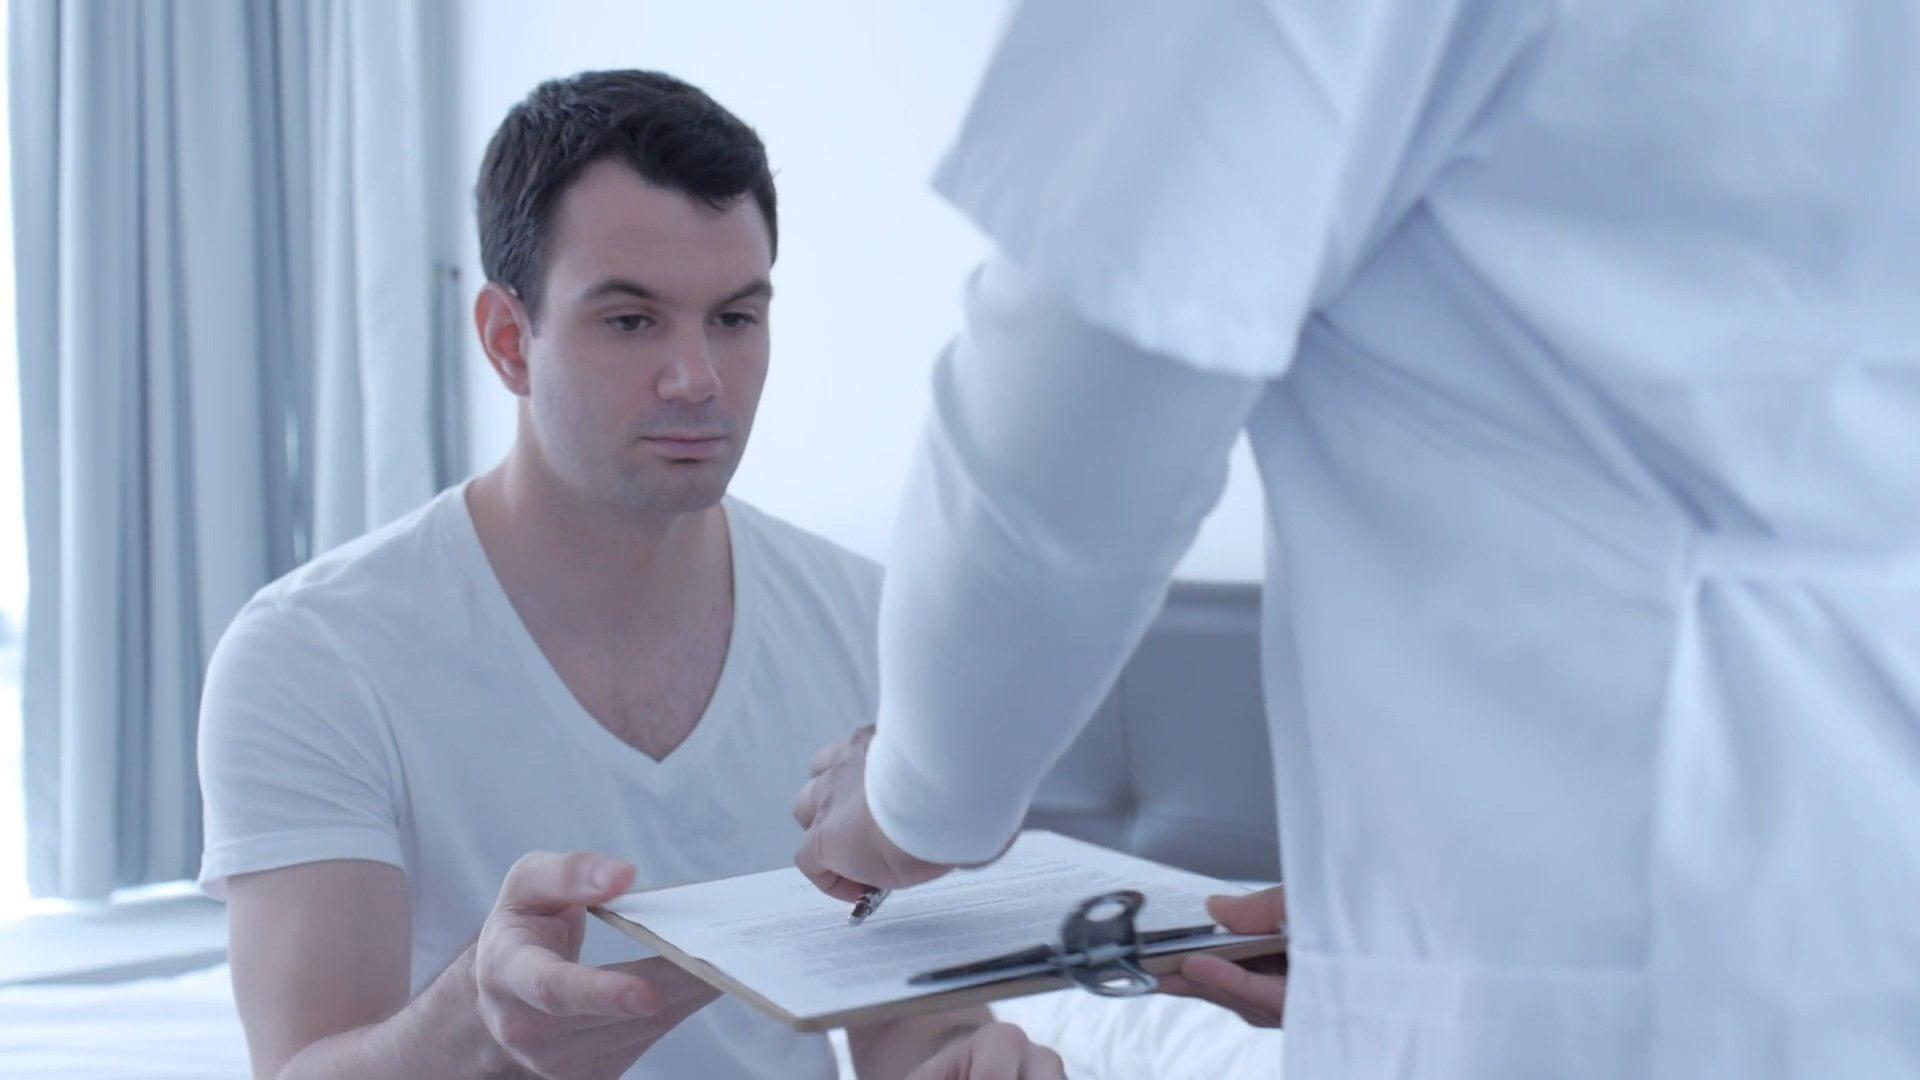 The Clinic - Short Film